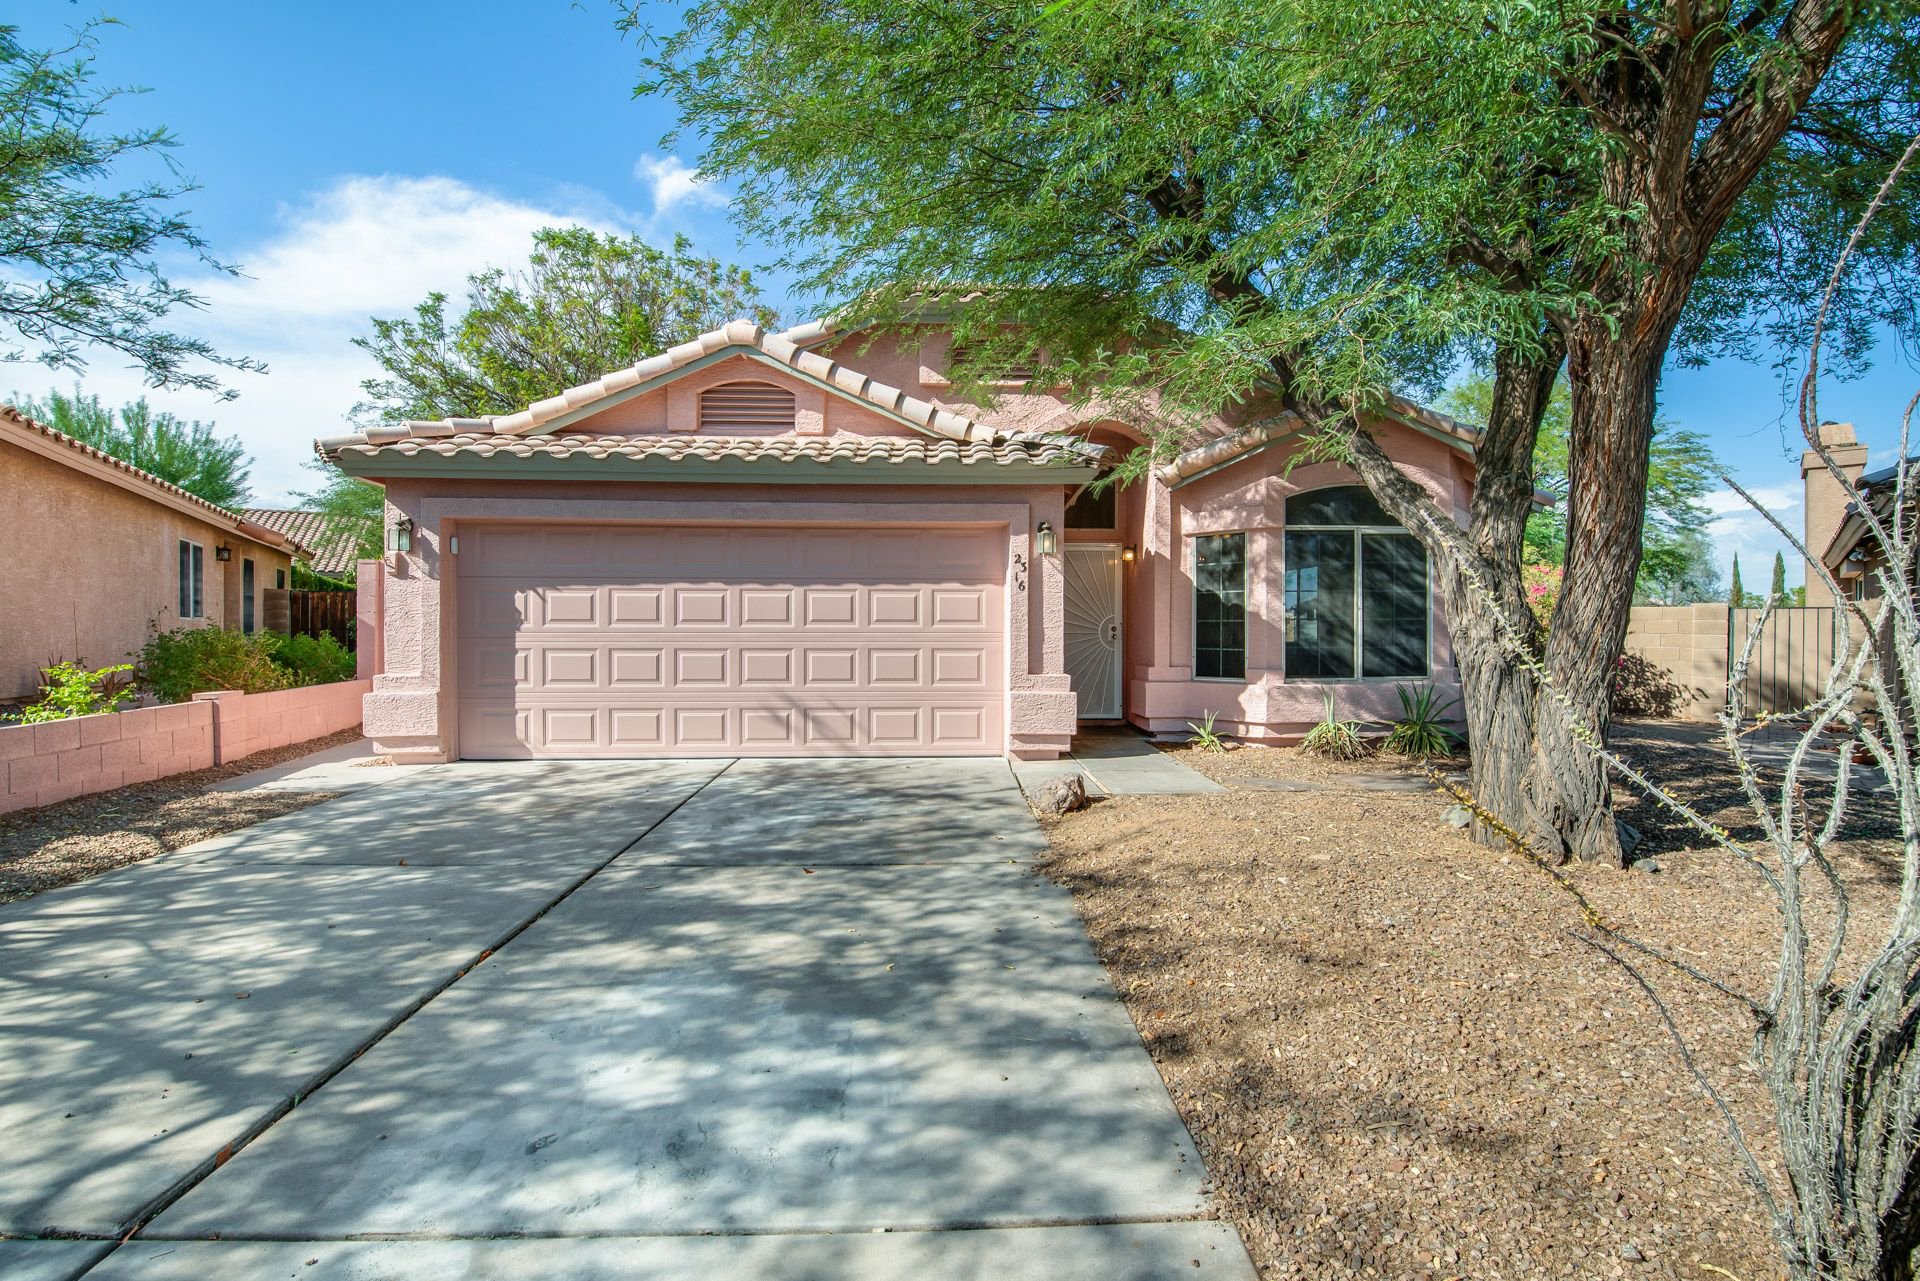 180803-median-house-state-arizona